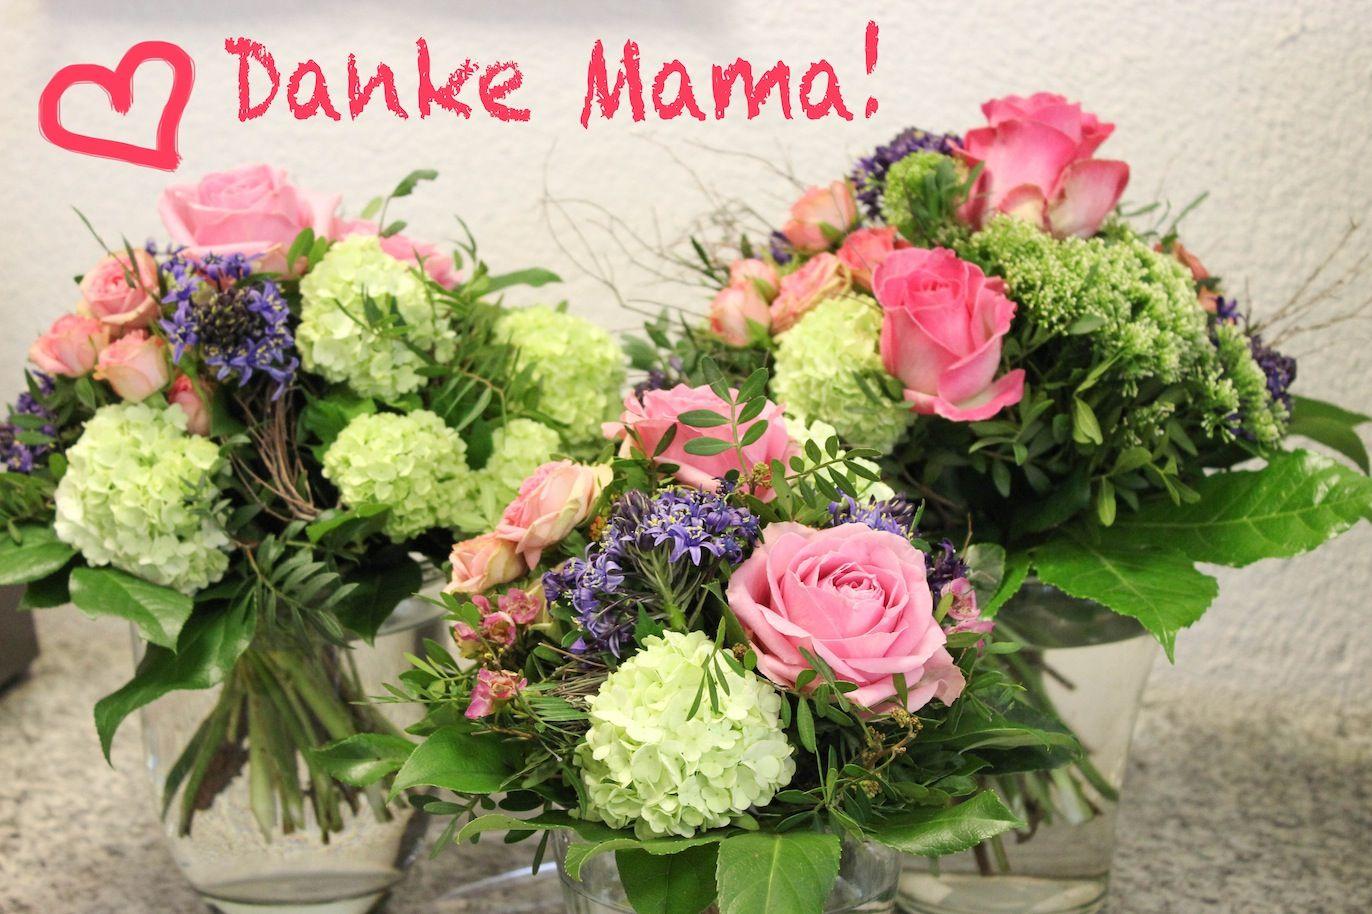 Danke Mama Muttertag 10 Mai Blumenstrauss Danke Mama Muttertag Blumenstrauss